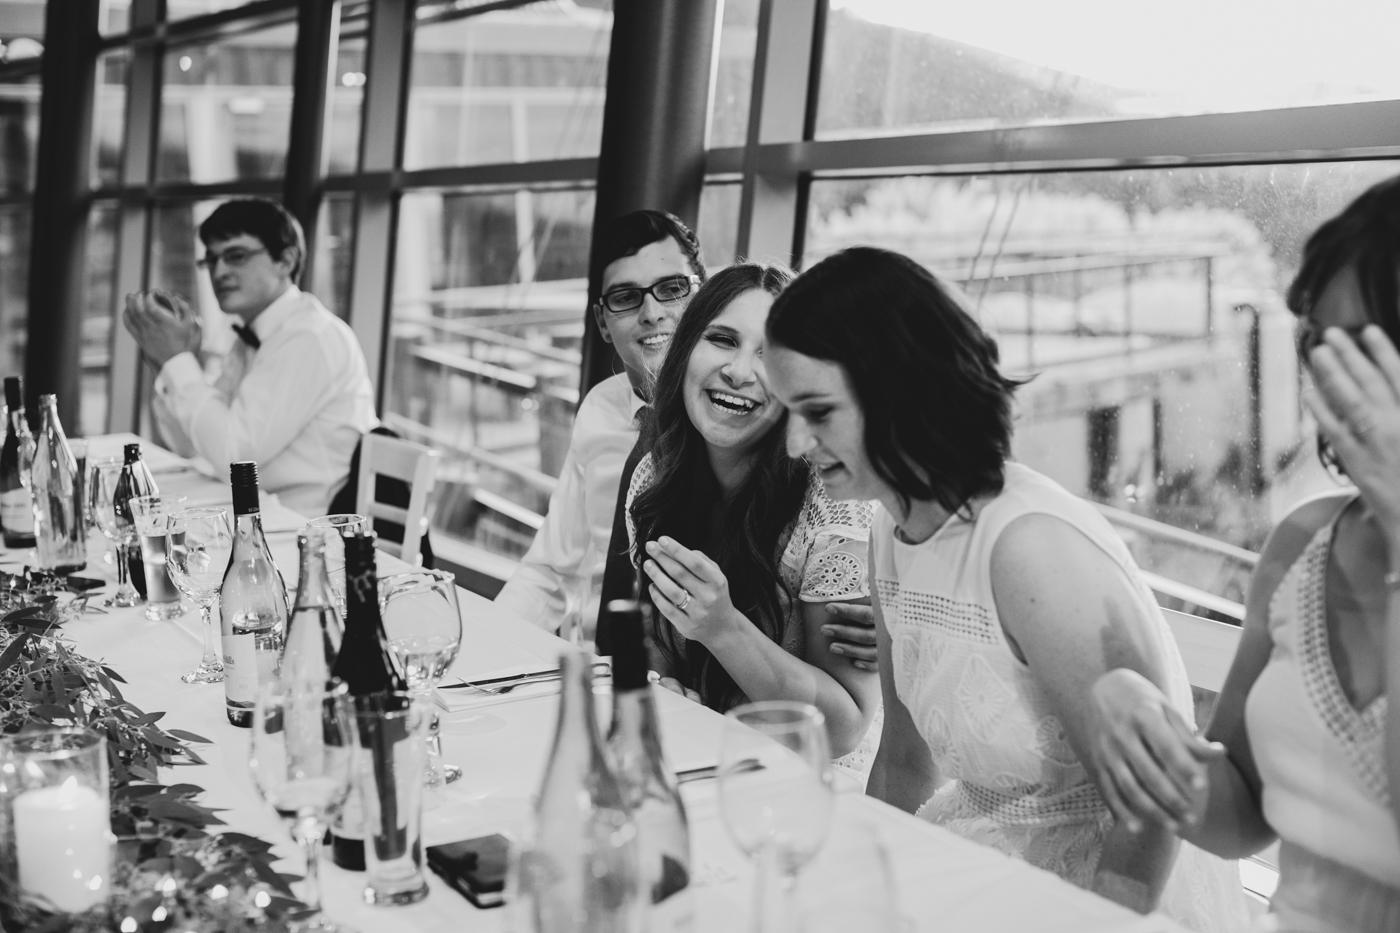 Ariana & Tim - Dunedin, New Zealand Wedding - Destination Wedding - Samantha Heather Photography-247.jpg